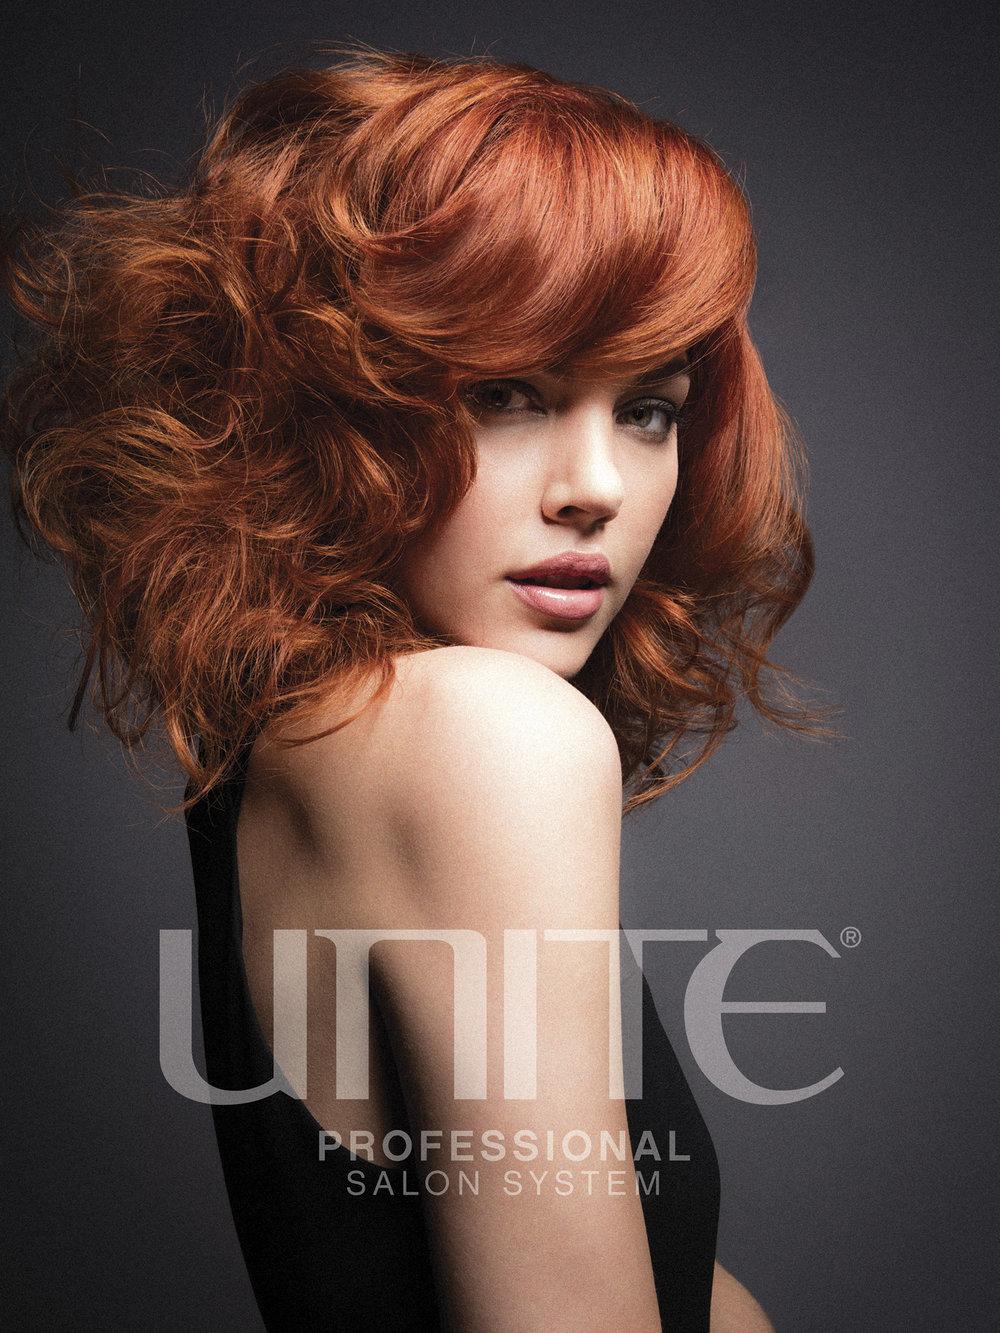 UNITE-ModelPoster-18x24-V1 copy.jpg